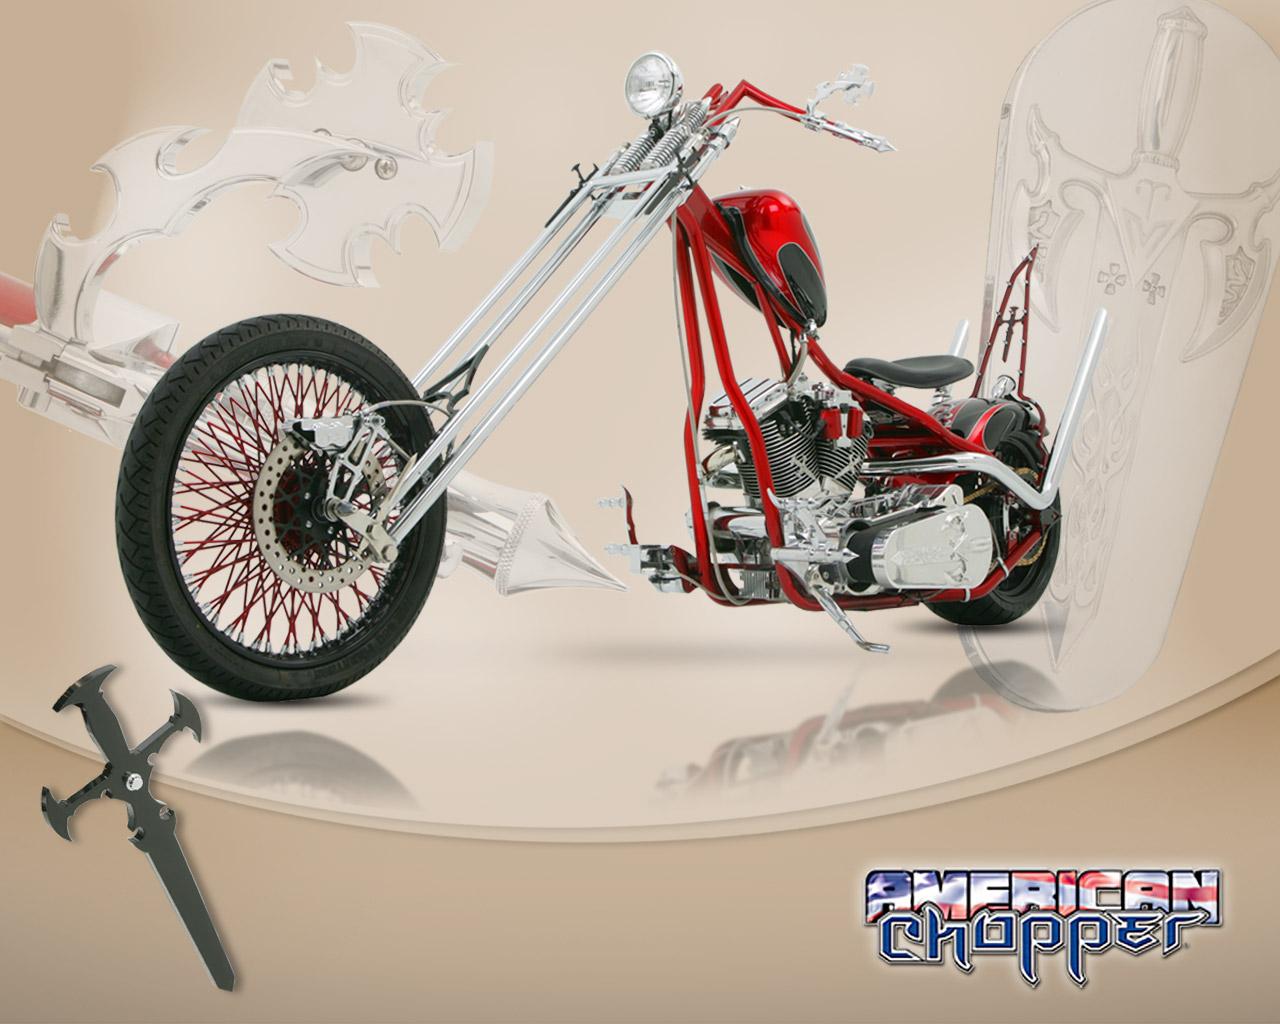 American Choppers Desktop Wallpapers All HD Wallpaper 2014 1280x1024